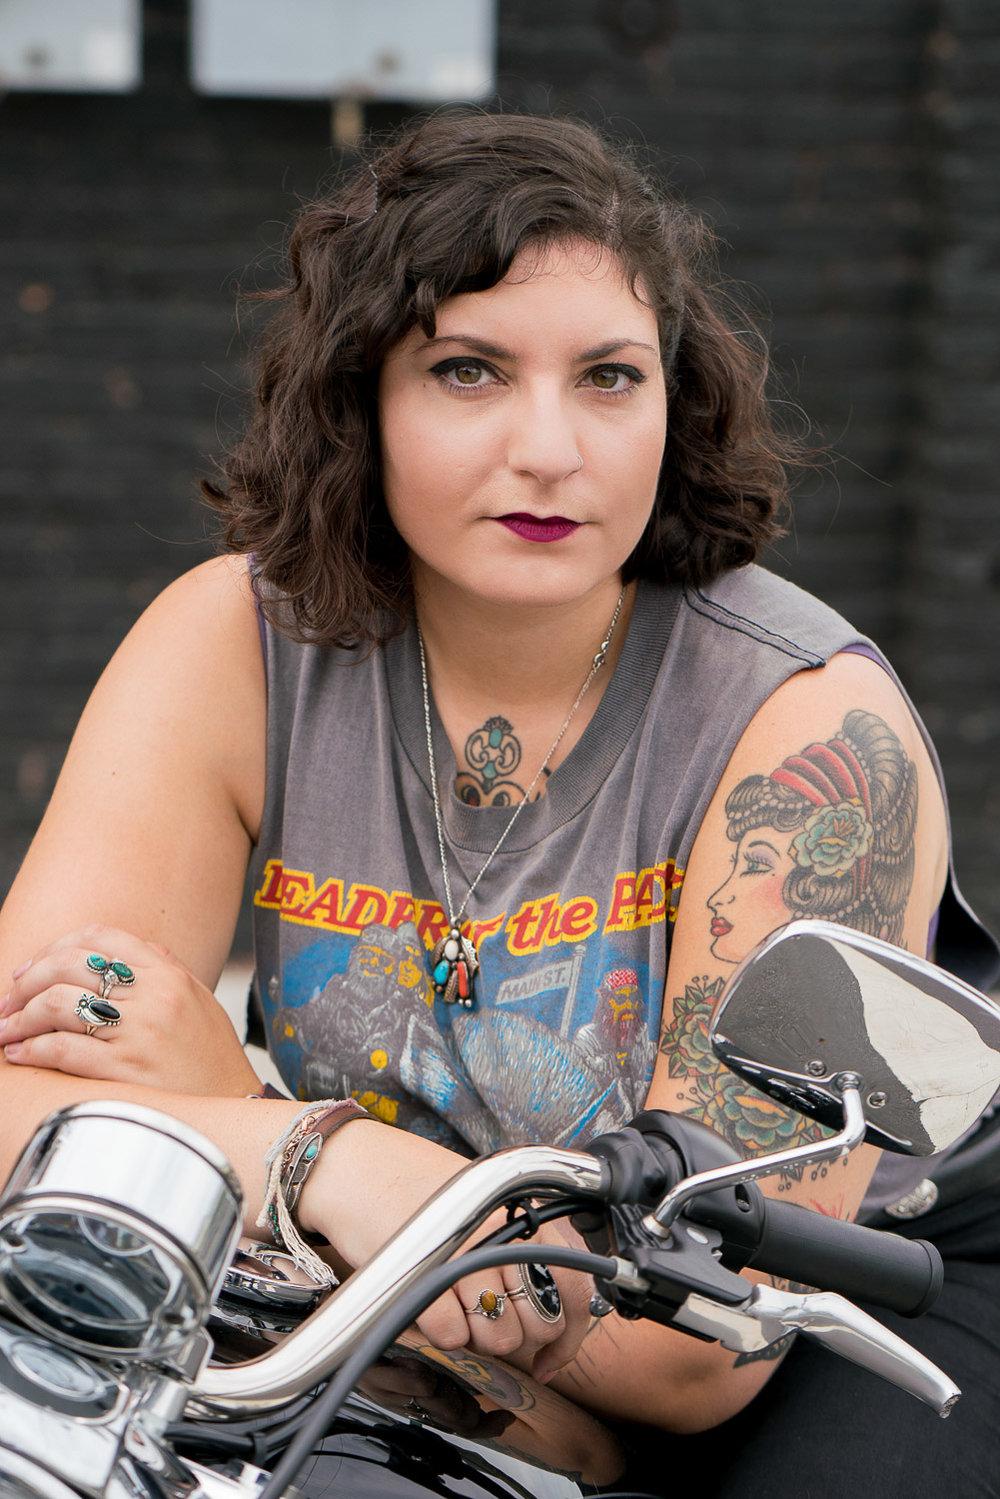 style photographer motorcyle